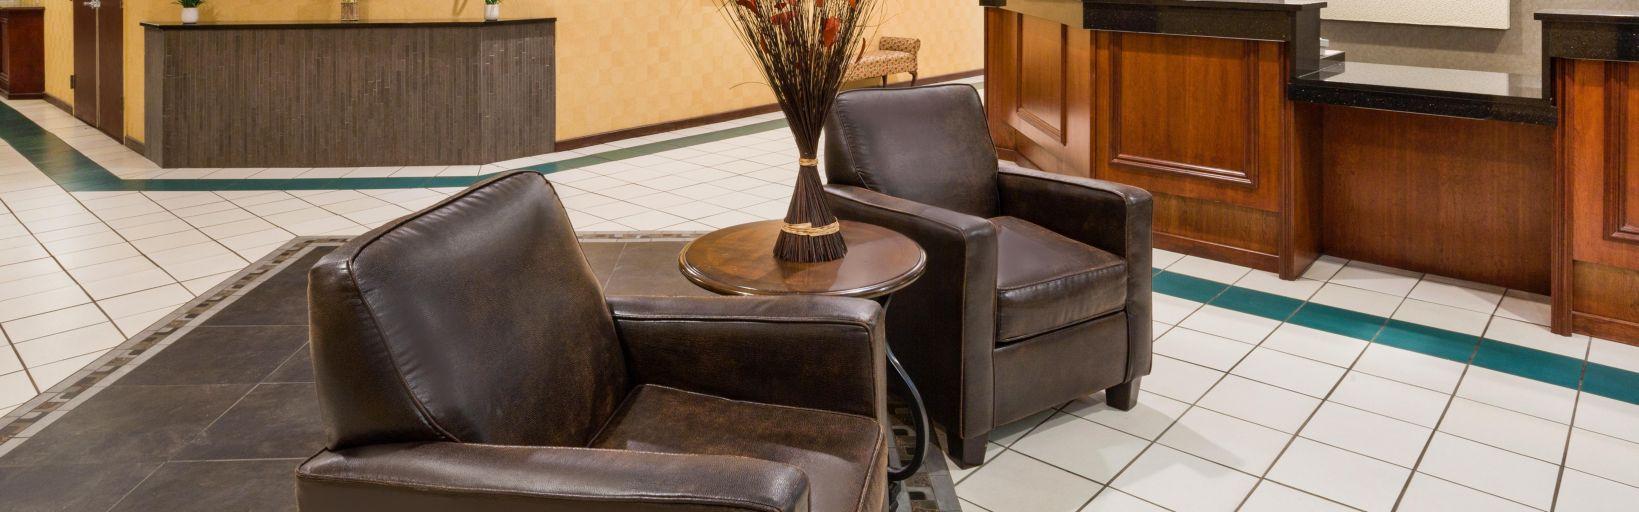 Fairmont Mn Hotel Lobby